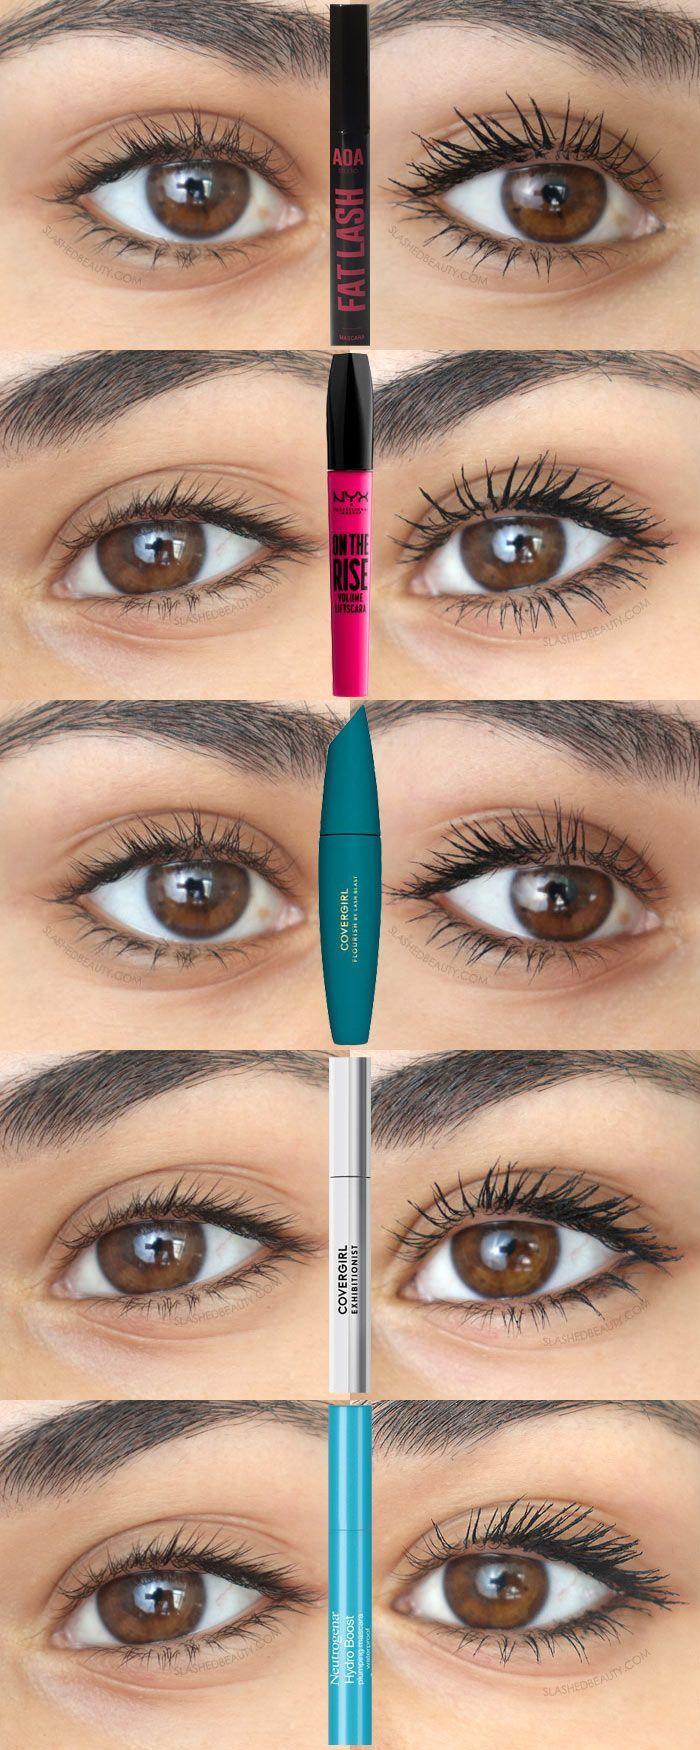 5 Current Budget-Friendly Mascara Favorites -   15 makeup Beauty budget ideas